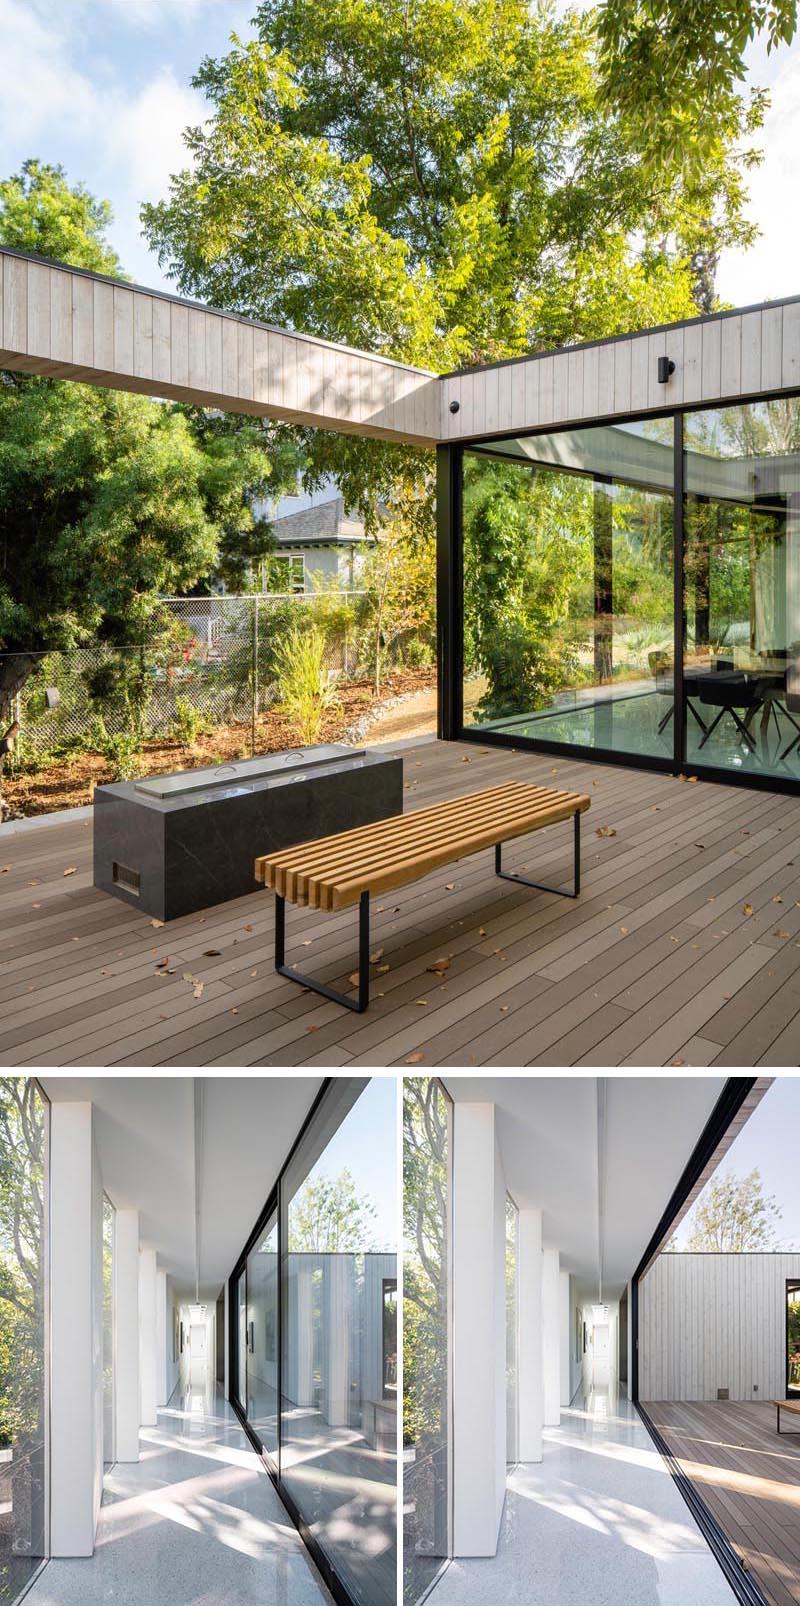 طراحی خانه مدرن و پلی